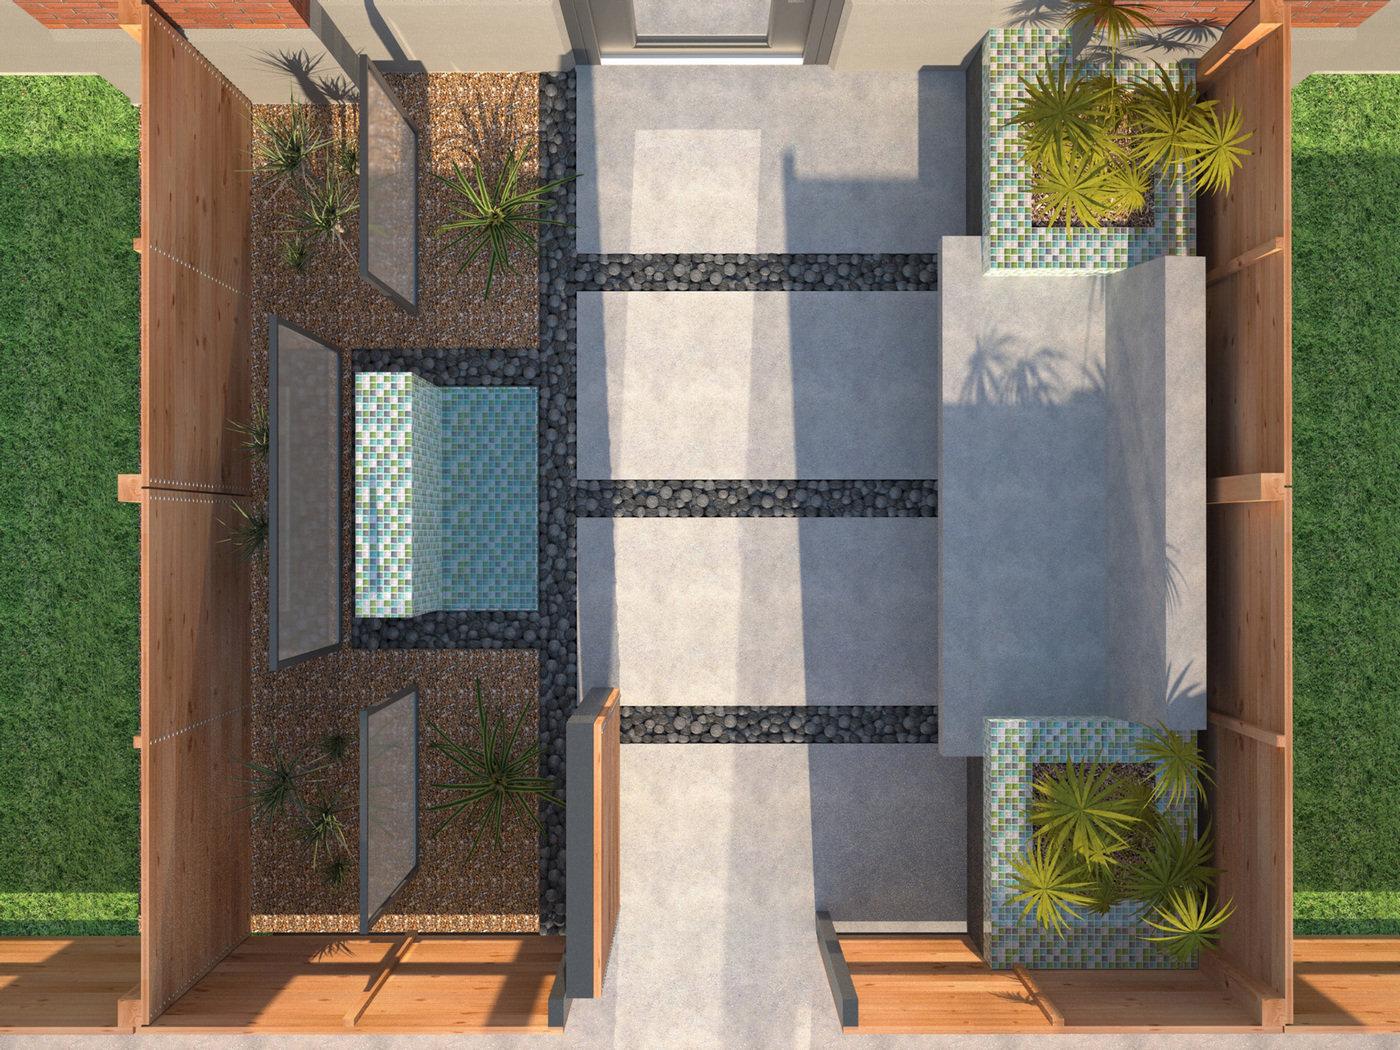 Architecture By Dave Slama At Coroflot Com